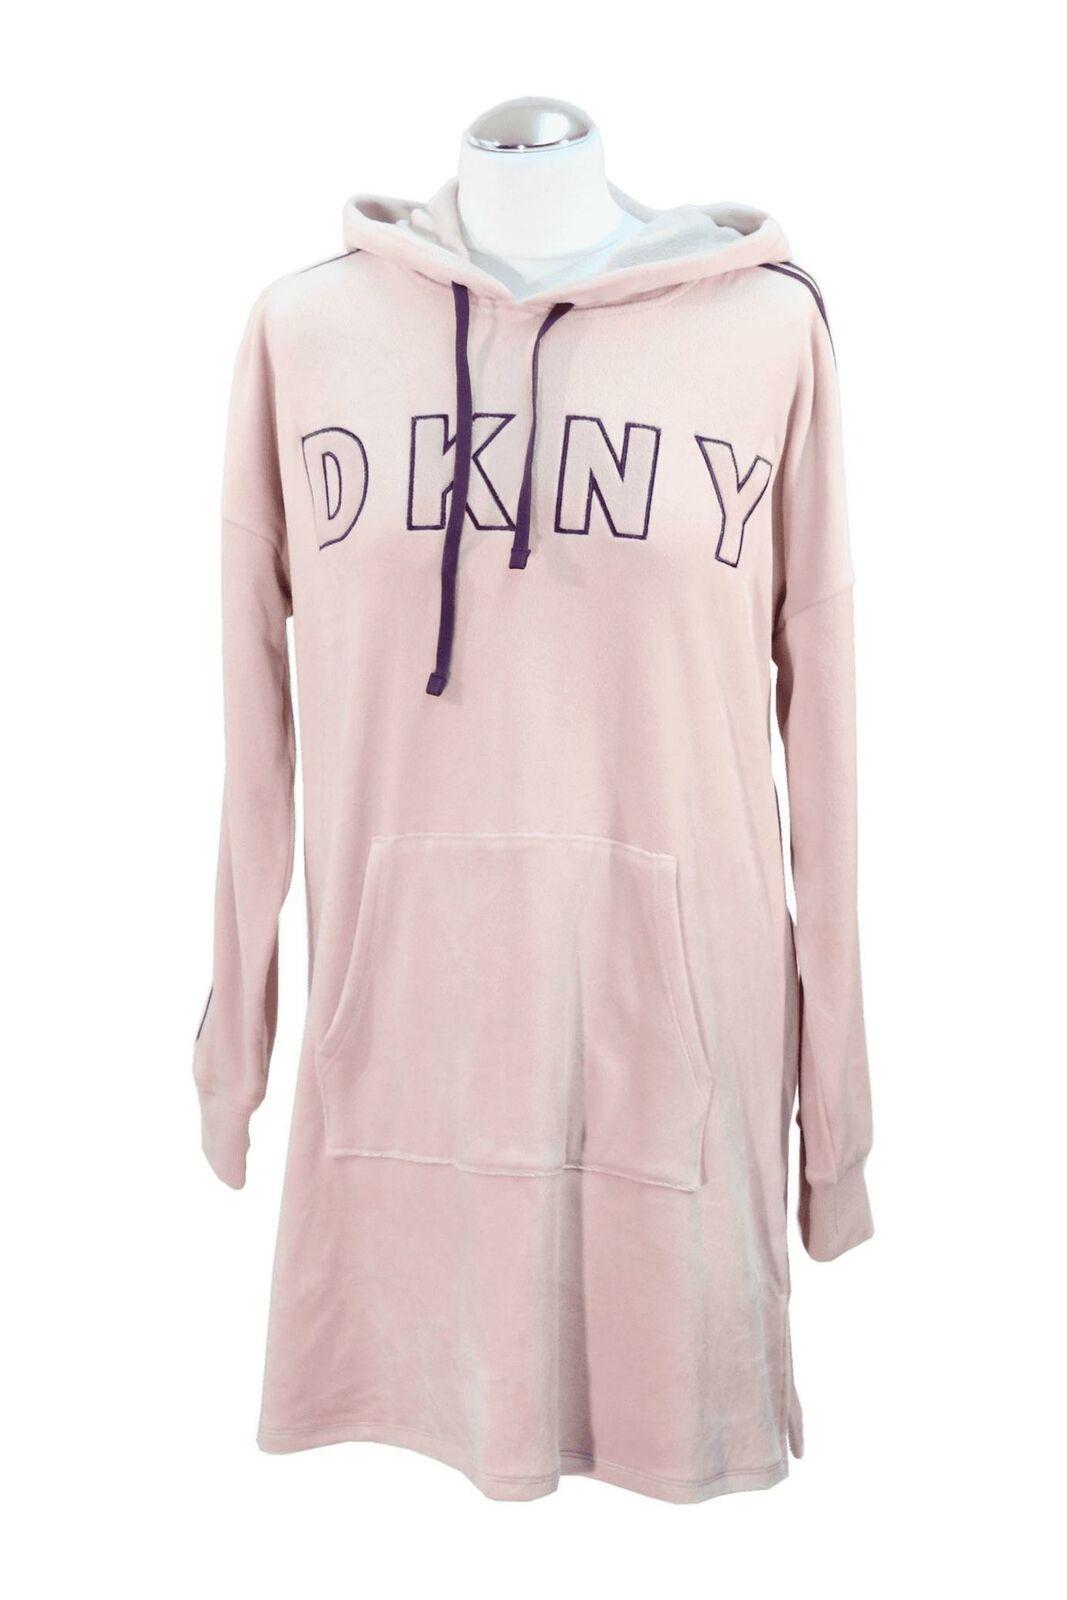 DKNY Schlafanzug Damen Gr. 36 NEU Rosa Nachtwäsche Pyjama